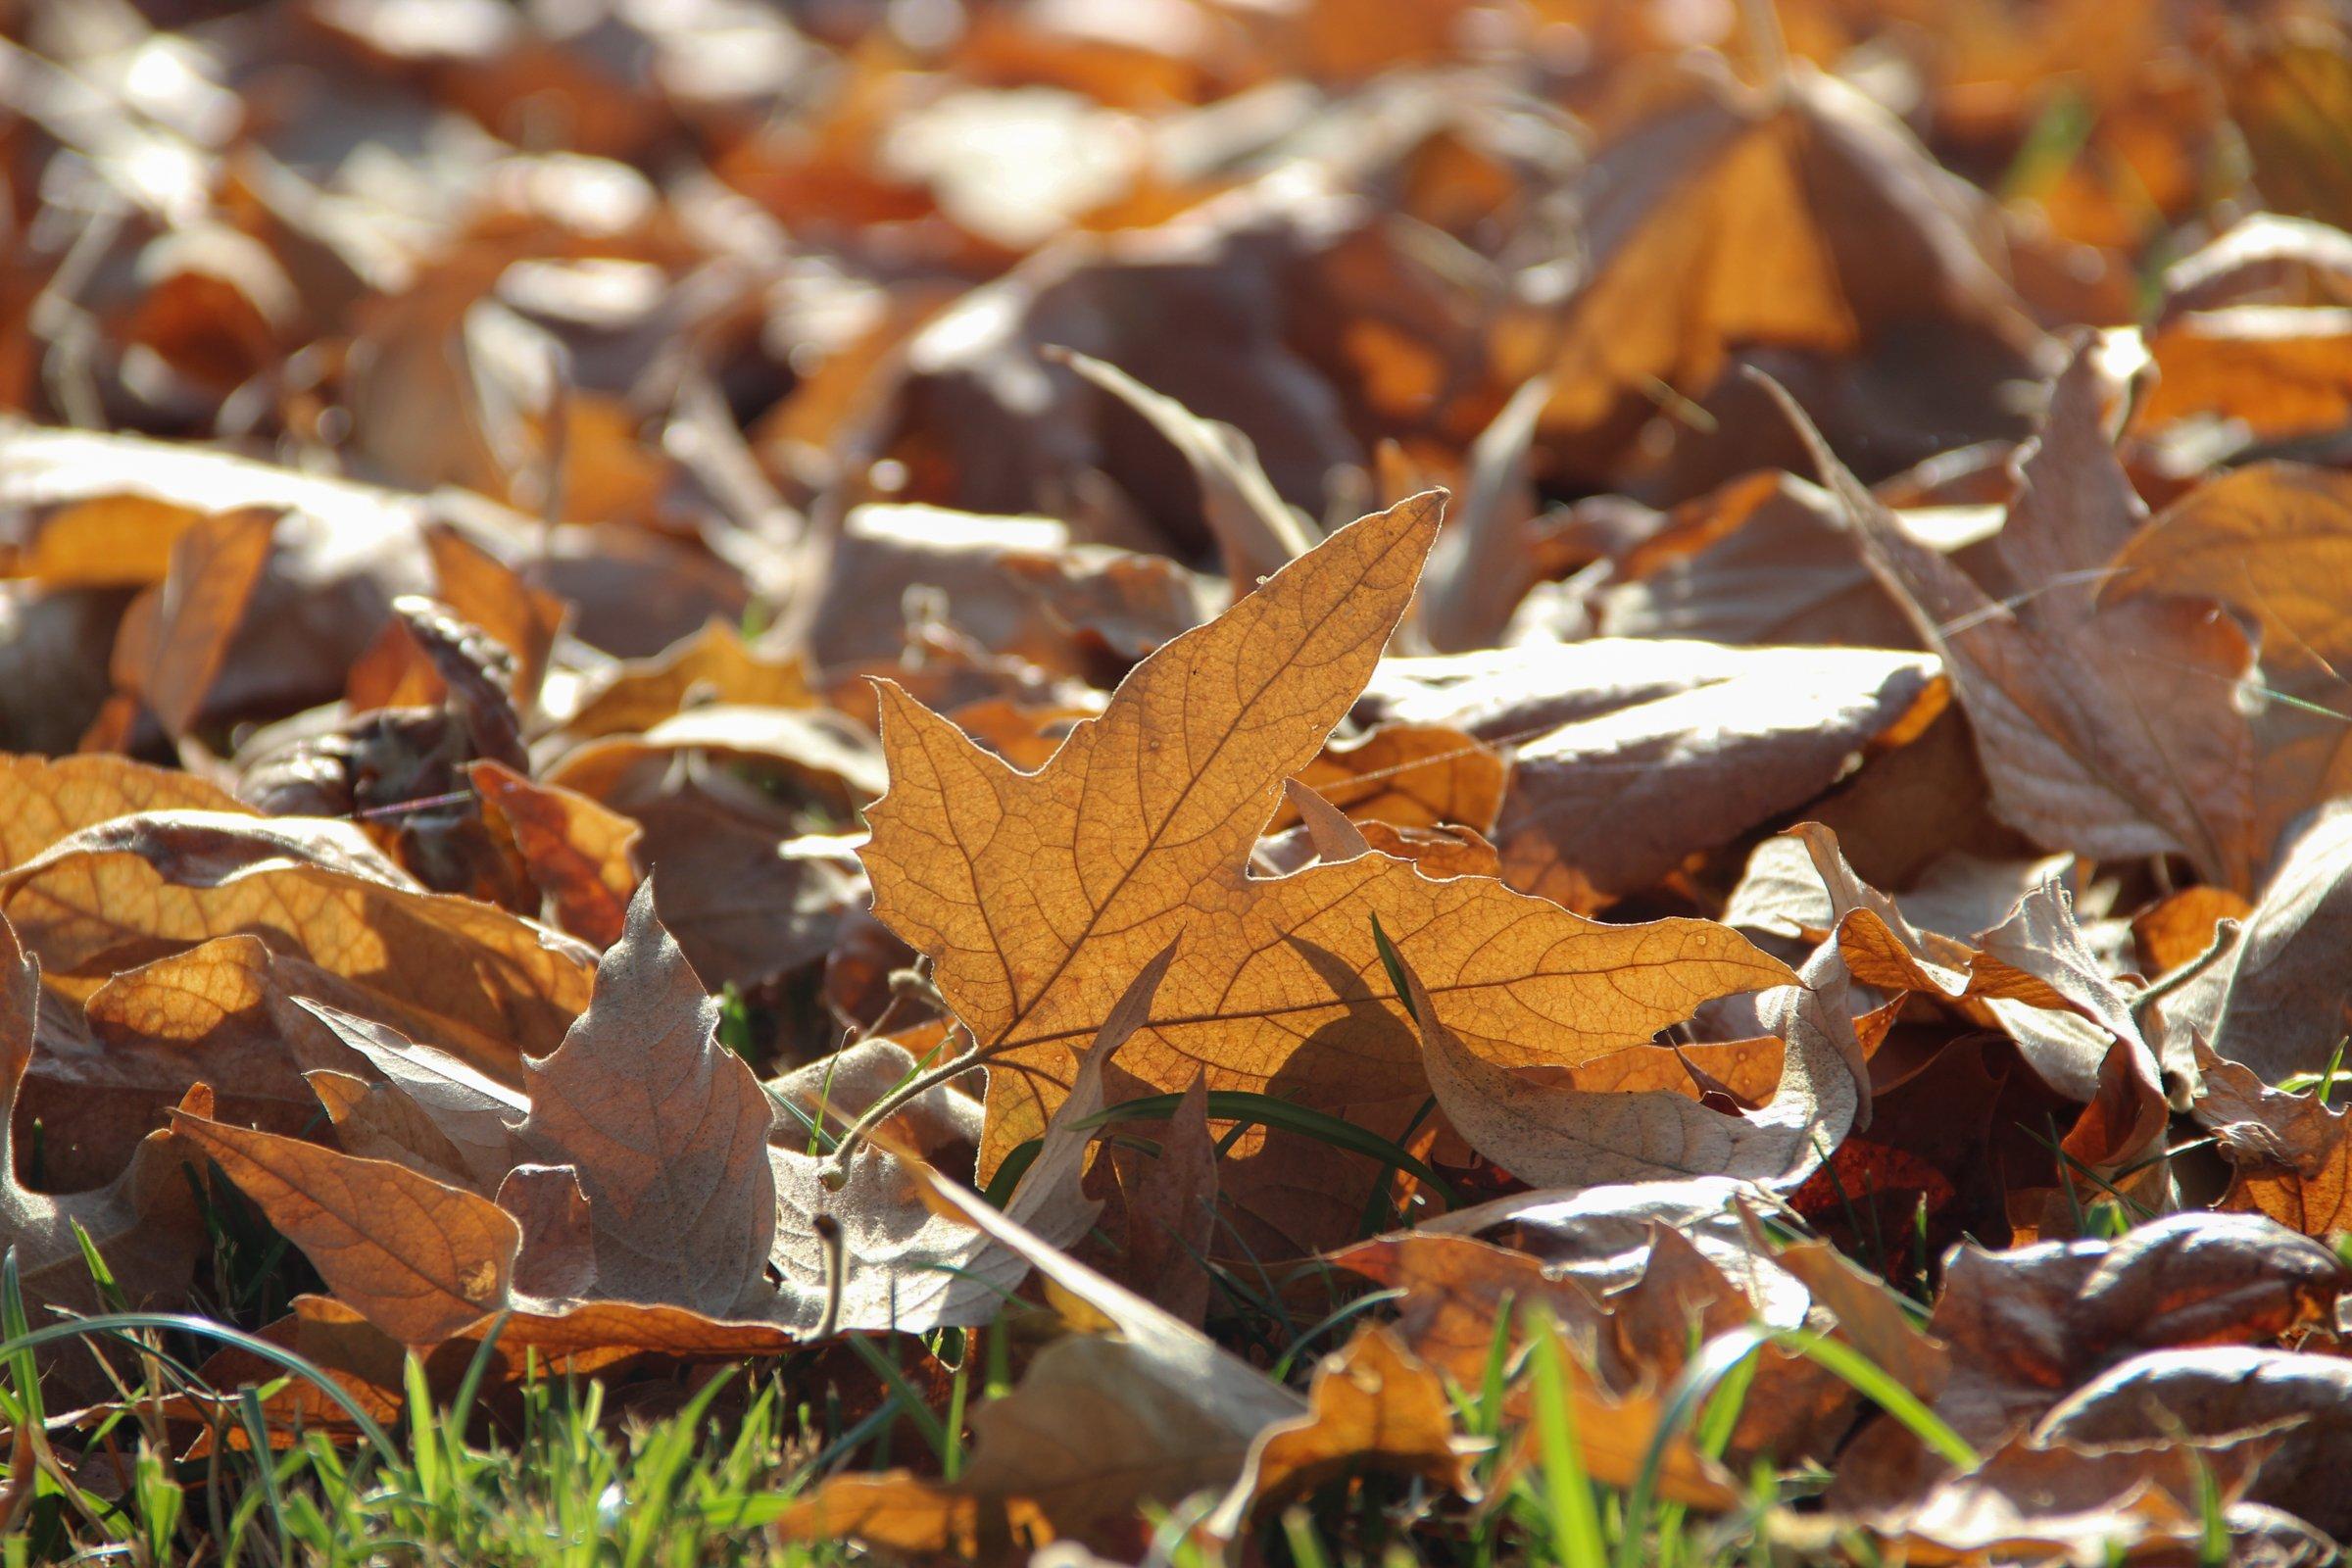 Dead Autumn Leaves On Grass